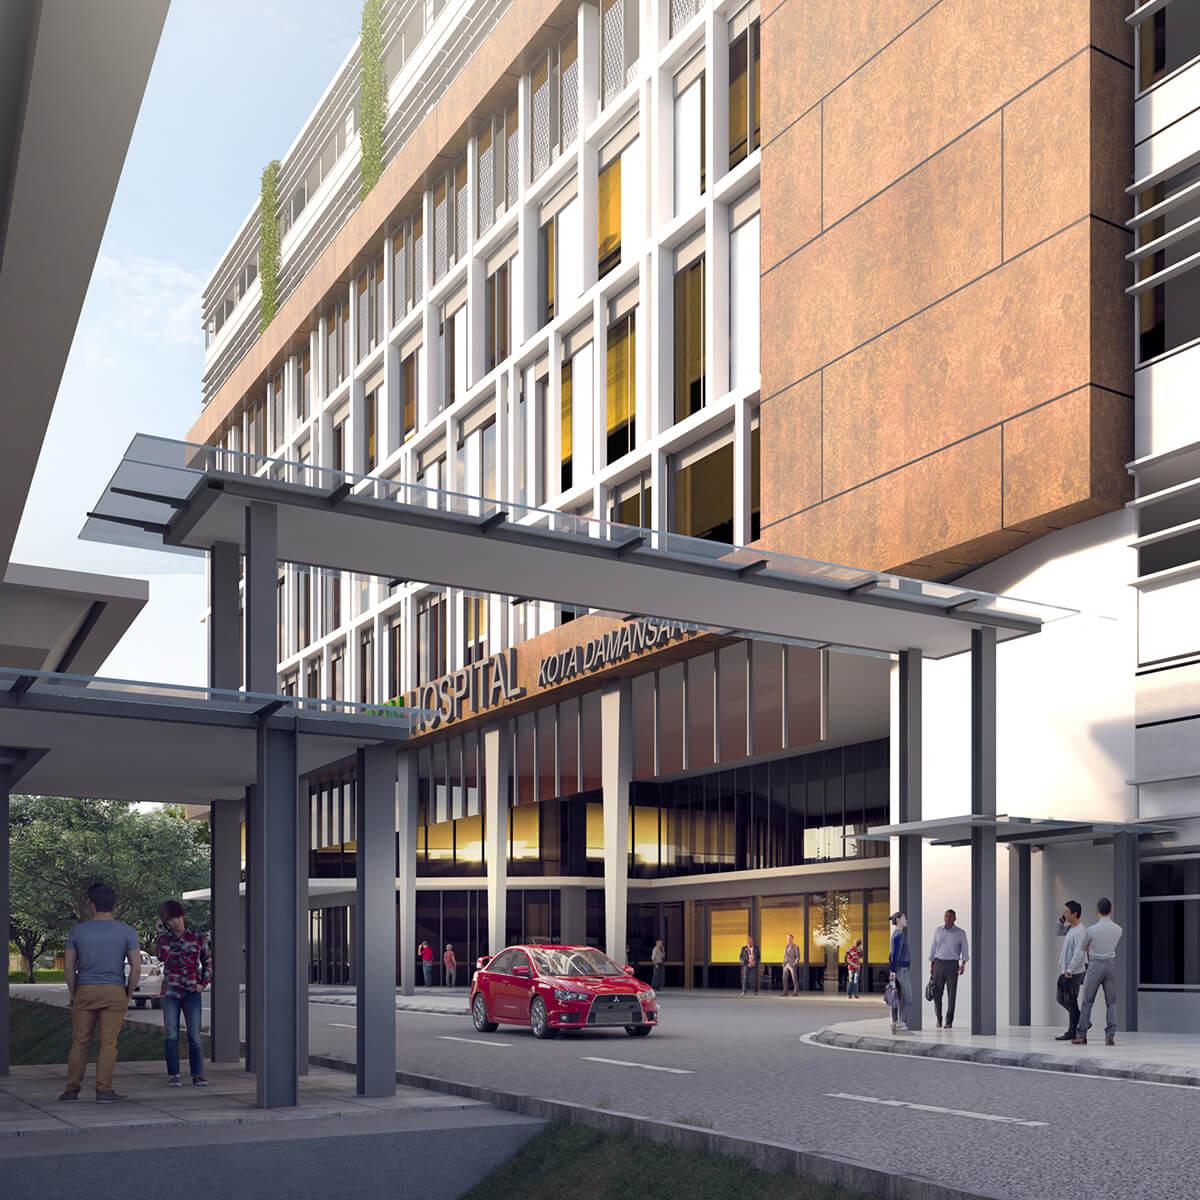 THKD Thomson Hospital Expansion 2